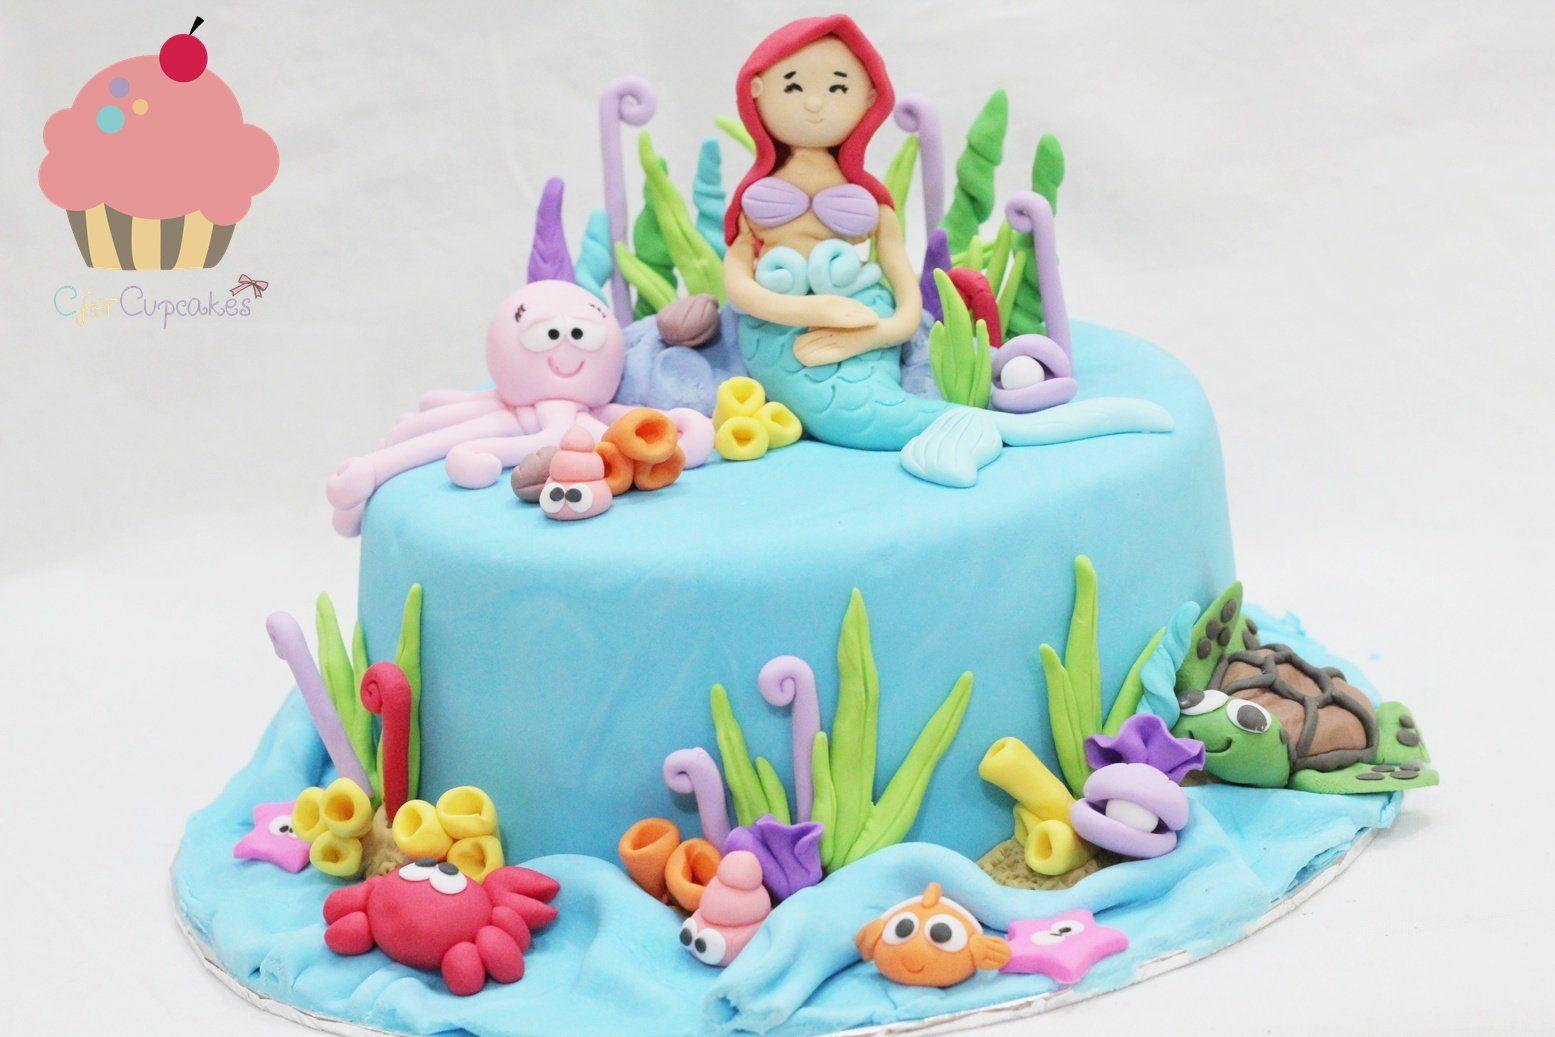 Little Mermaid 3D cake cupcakes Singapore Hand carve figurines